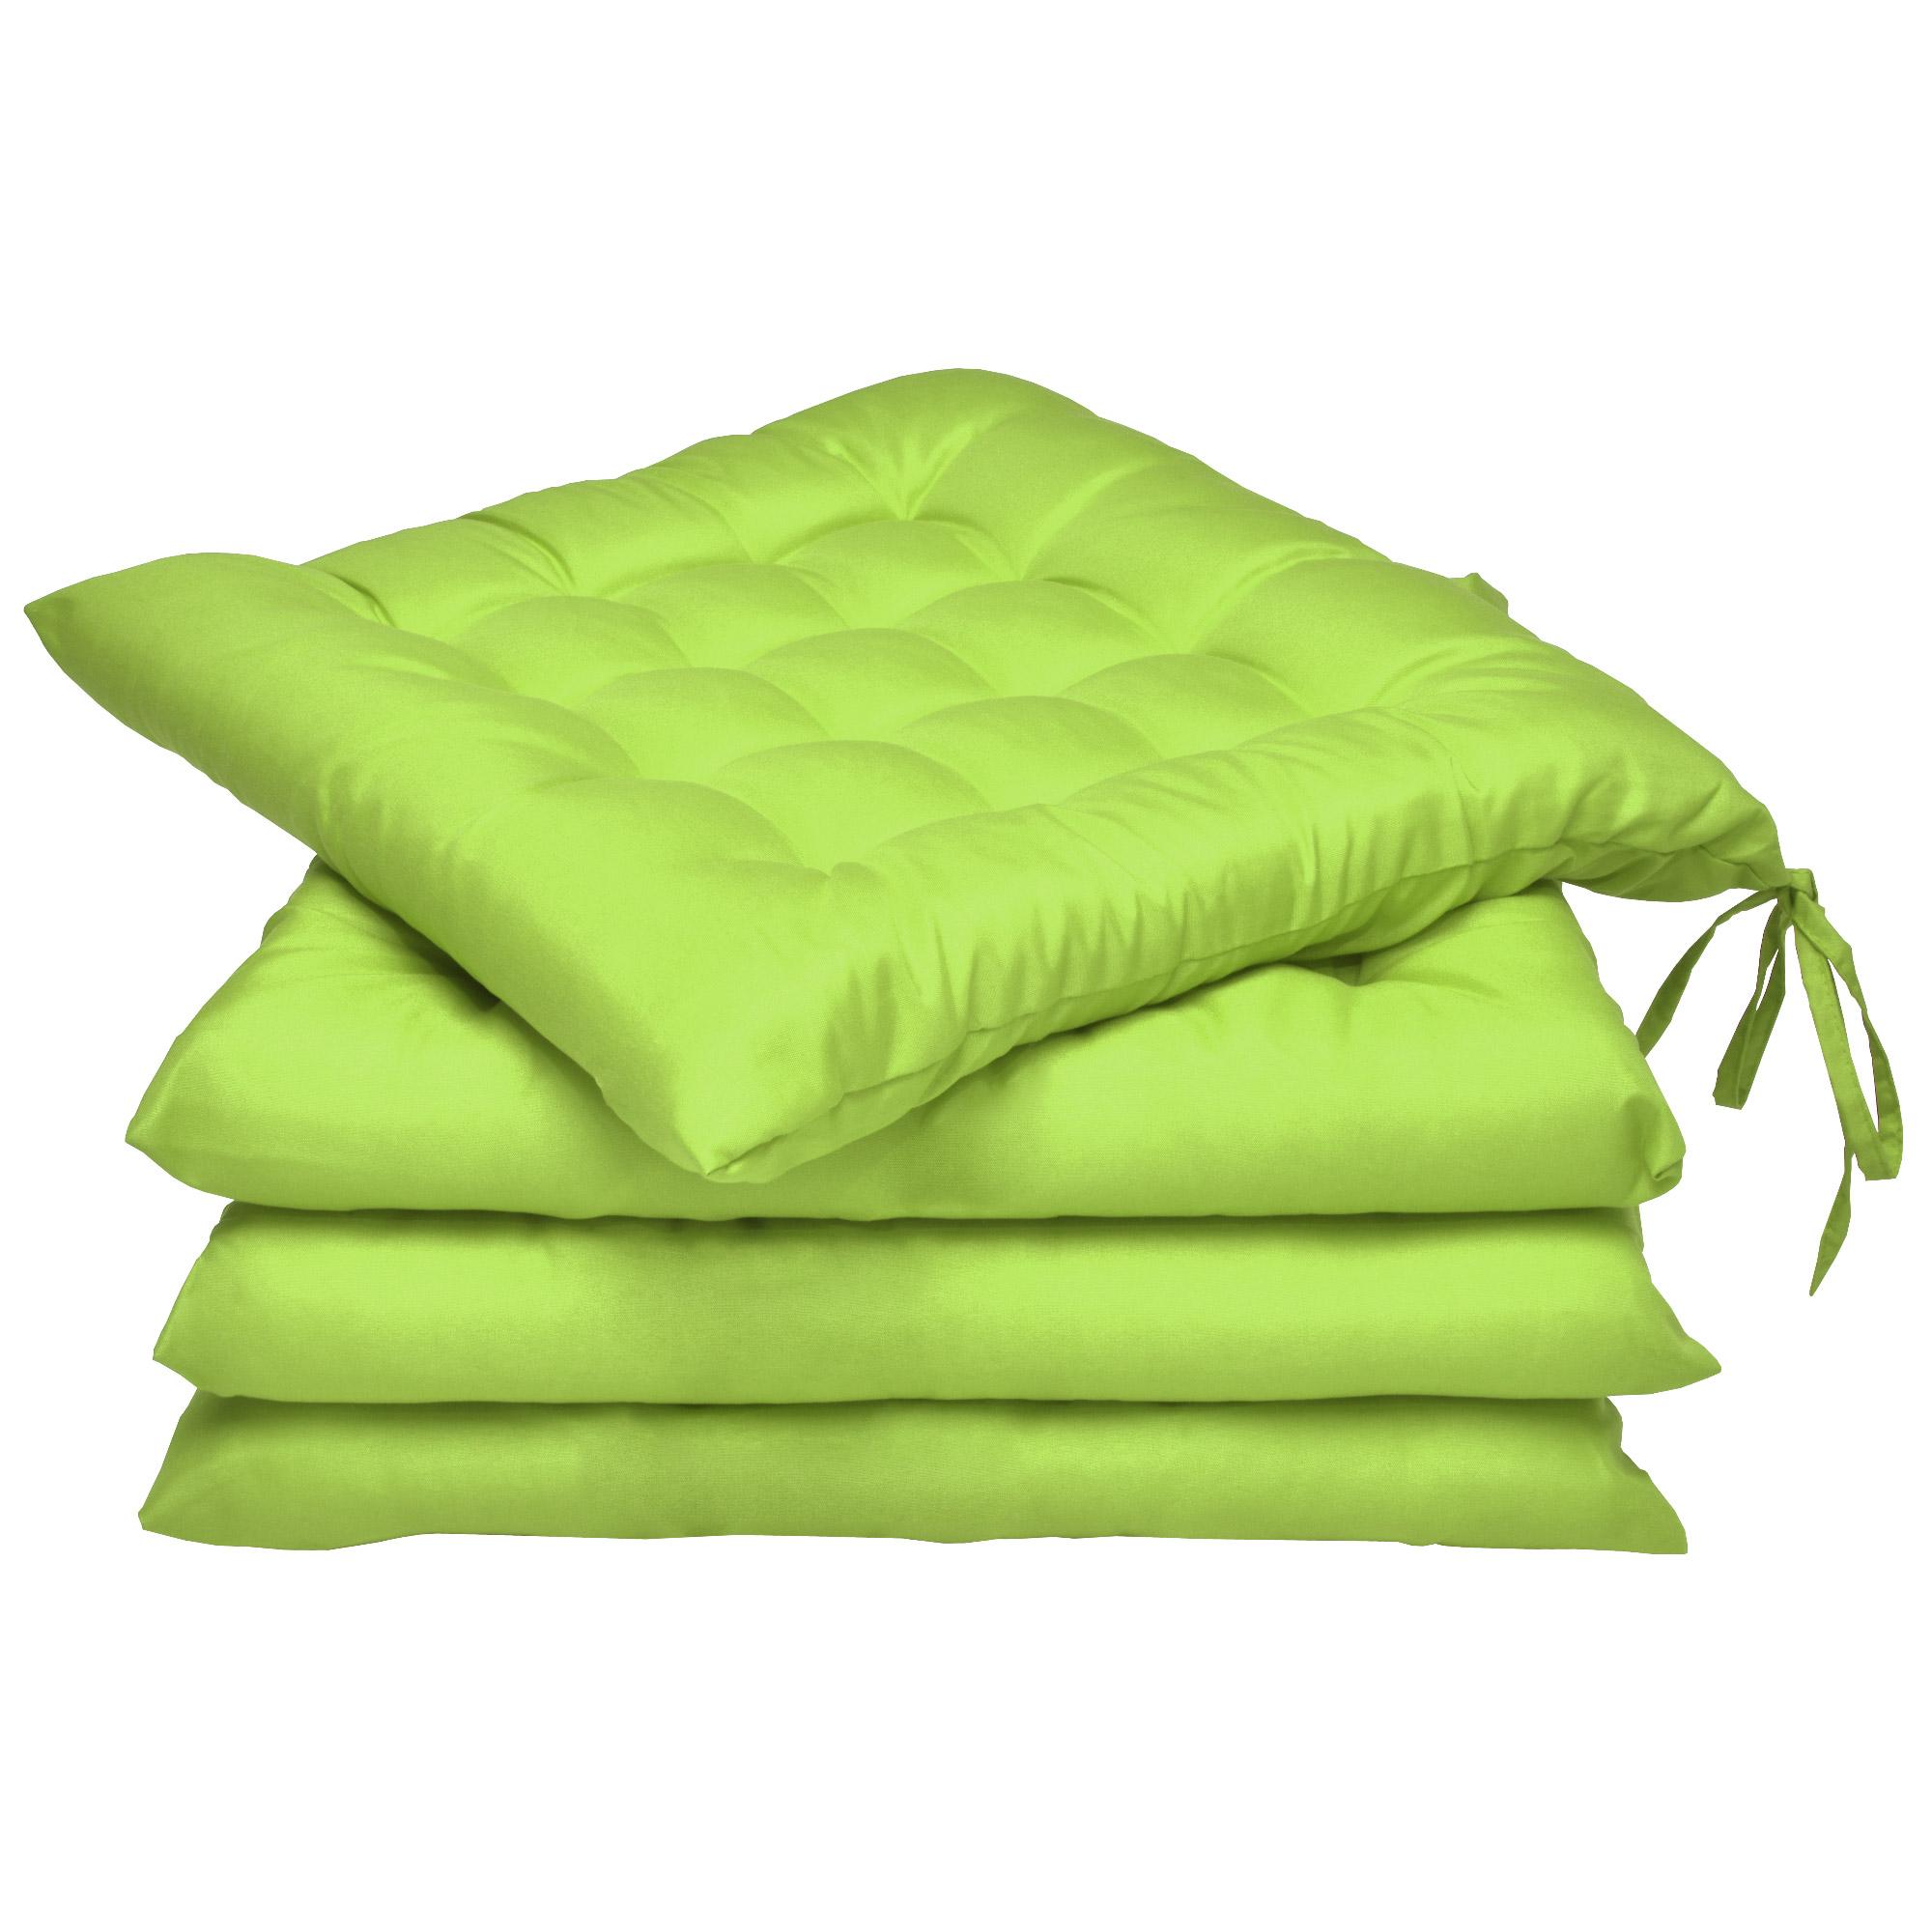 4er set sitzkissen lea 40x40cm gr n kaufen. Black Bedroom Furniture Sets. Home Design Ideas